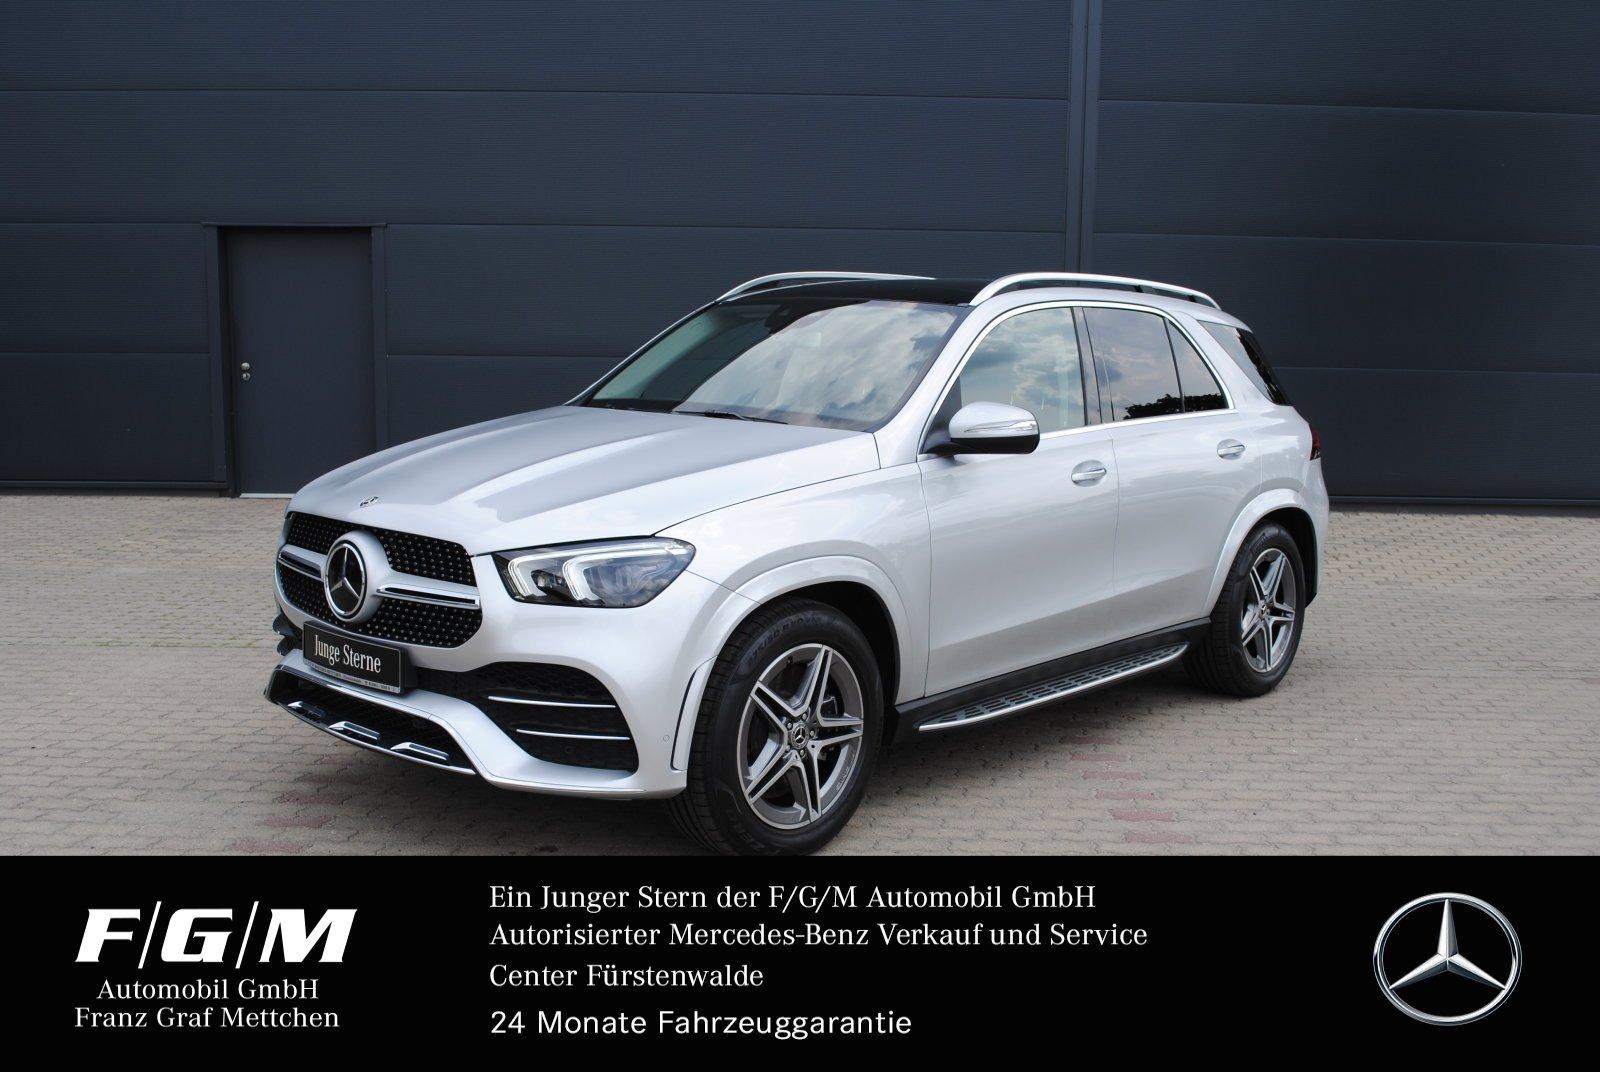 Mercedes-Benz GLE 450 AMG/MBUX/PanoD/KeyG/Memo/AHK/Distronic, Jahr 2019, Benzin